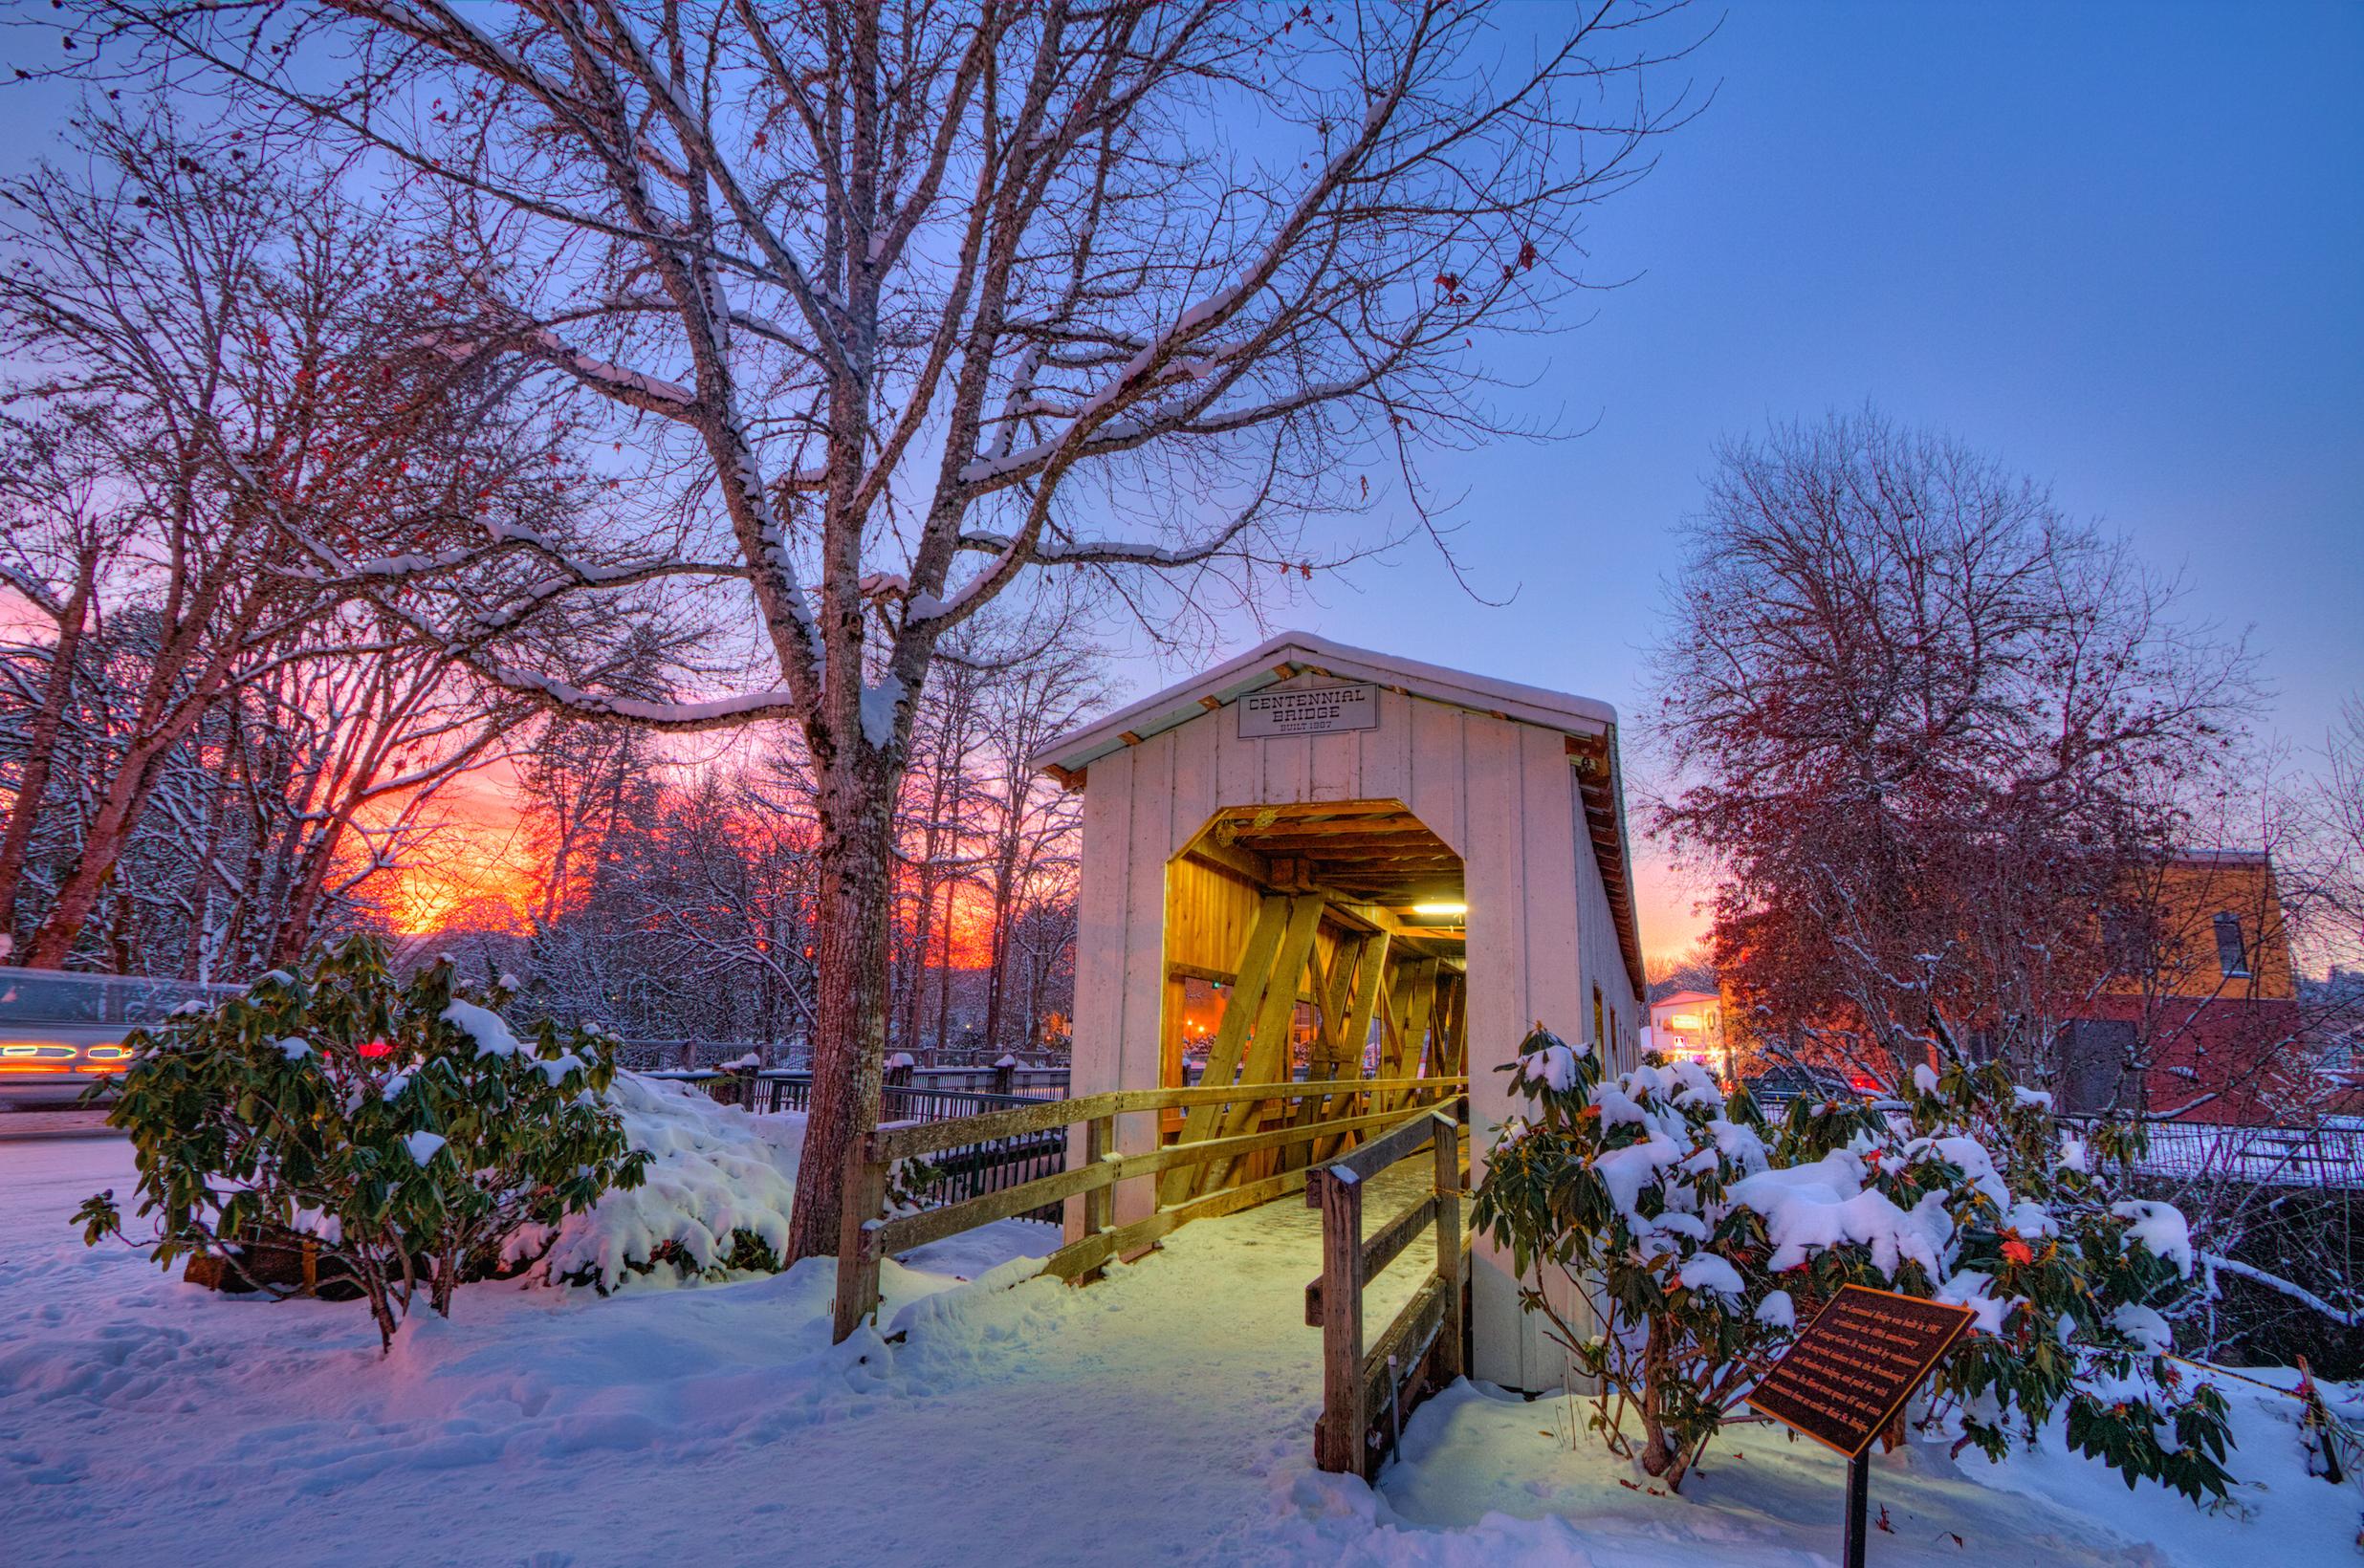 Centennial Bridge in Cottage Grove